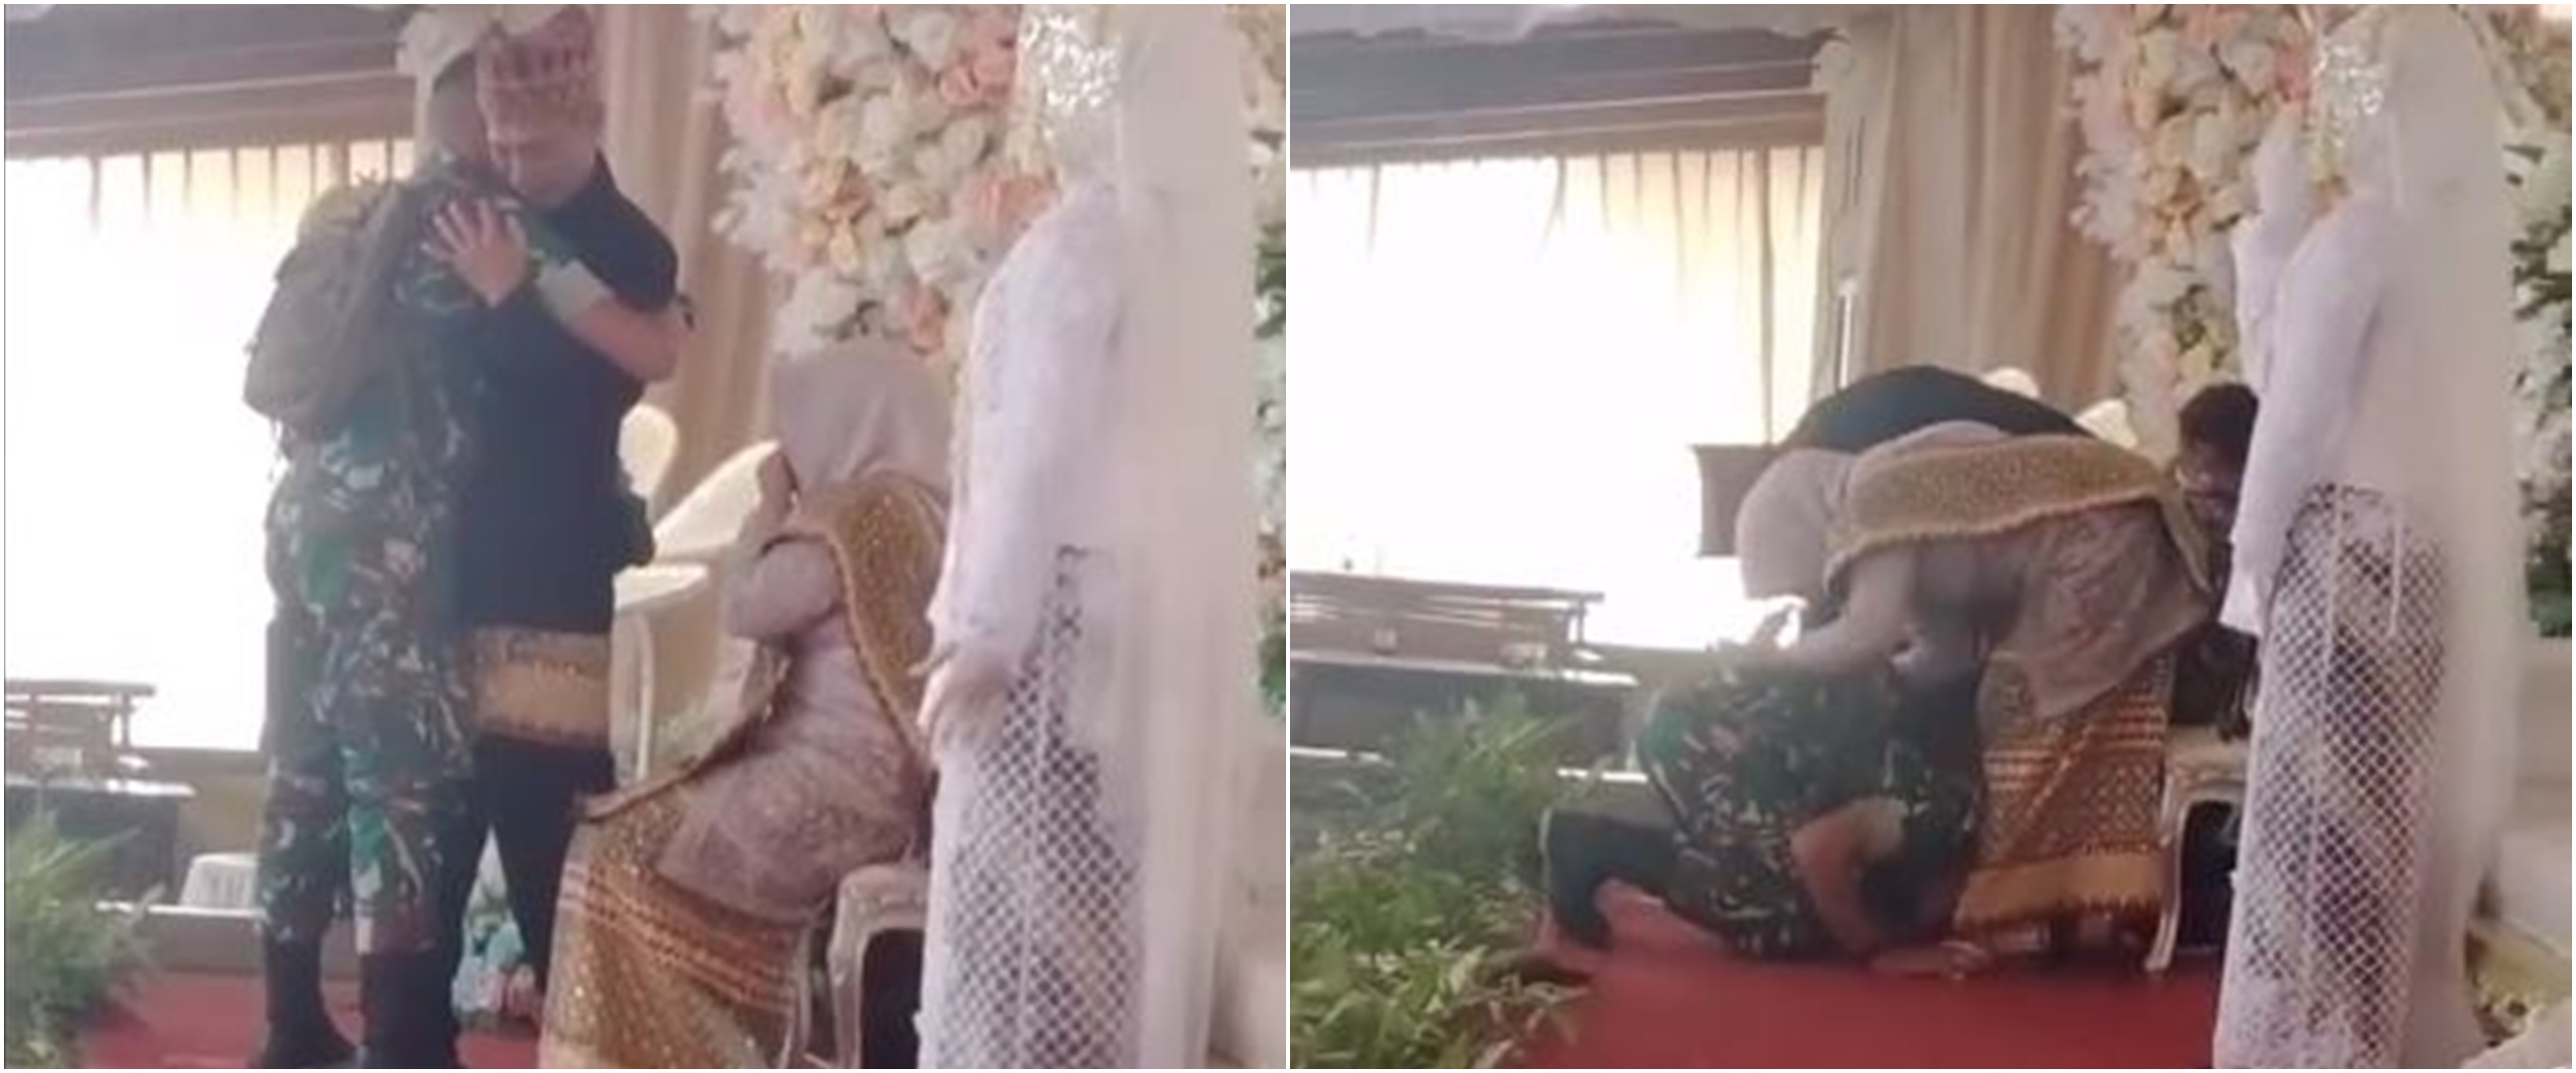 Hadiri pernikahan mantan, seorang TNI mencium kaki ibu mempelai wanita